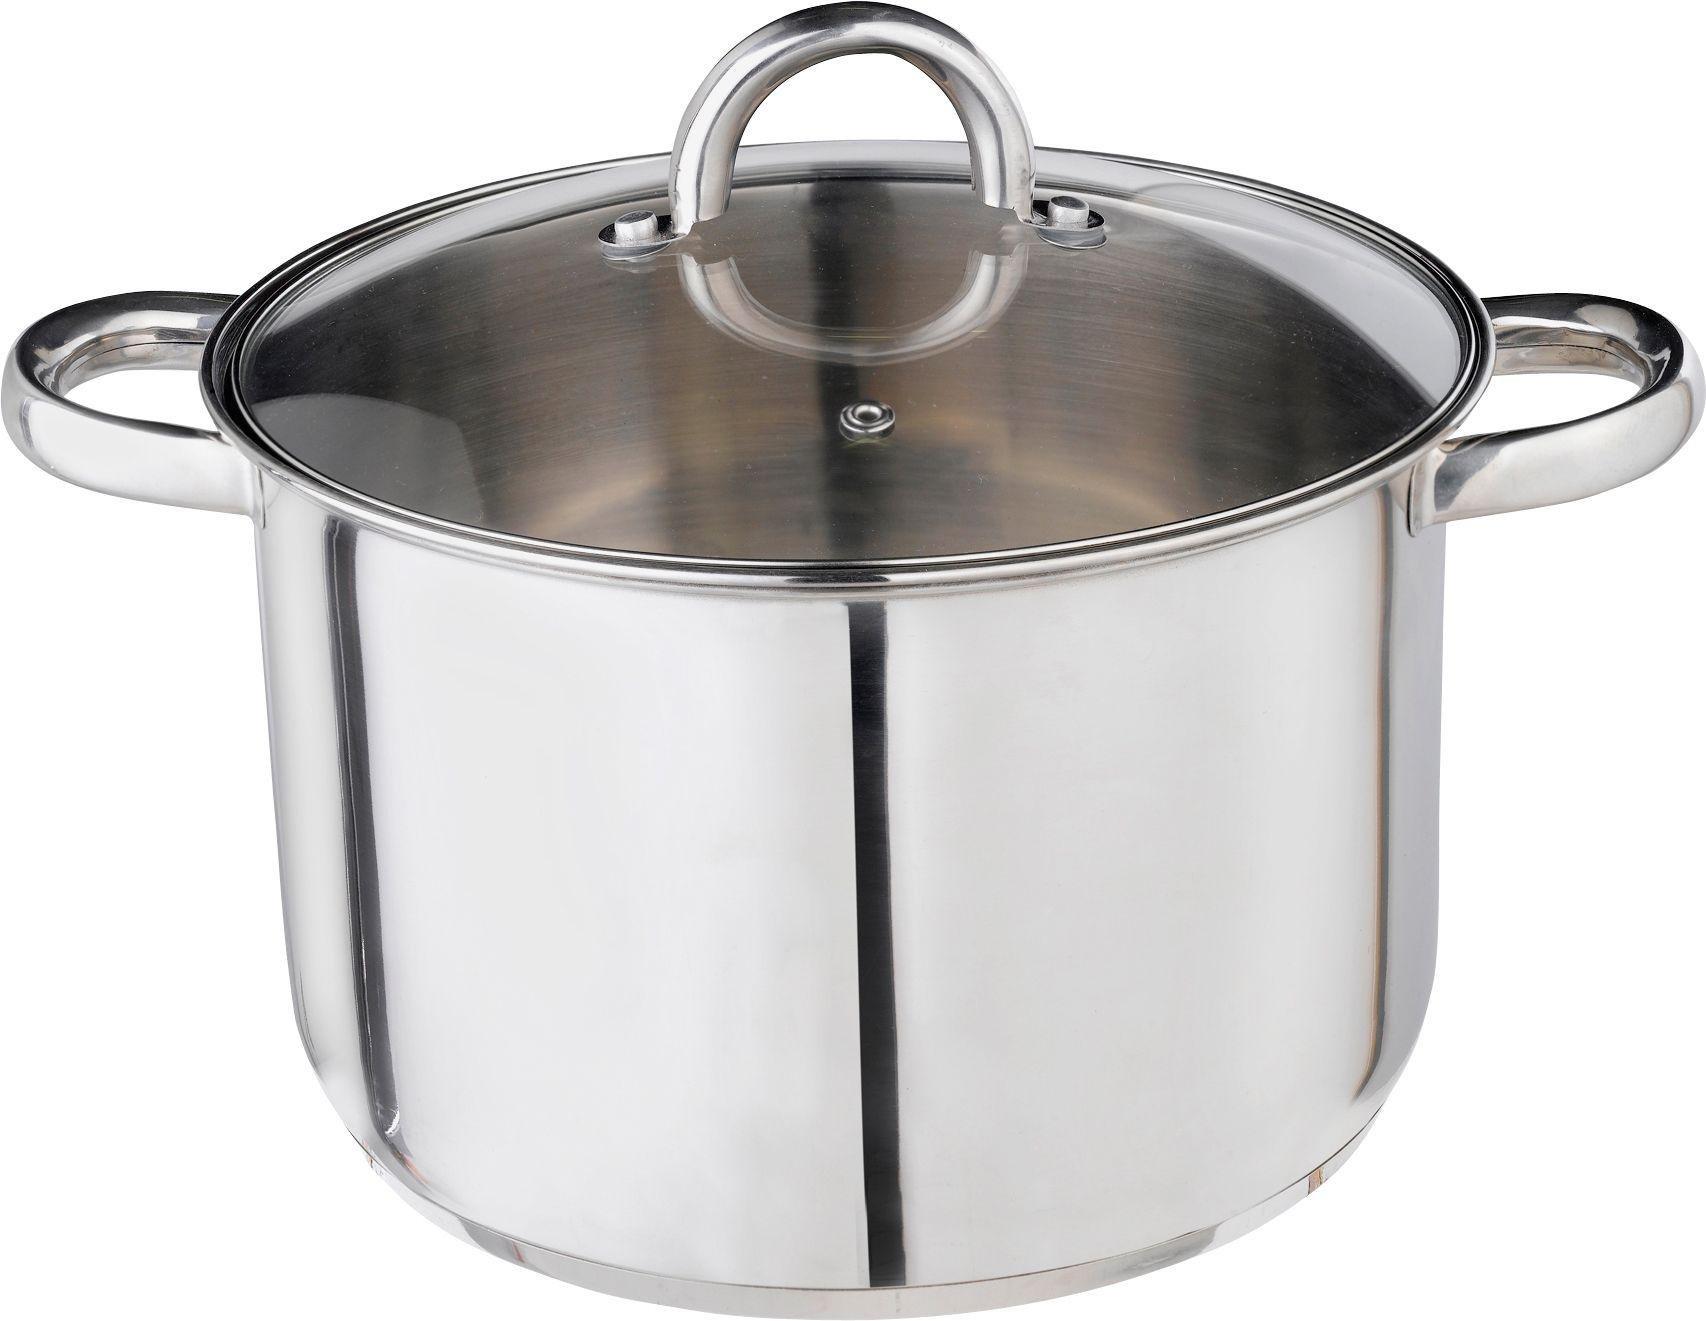 Argos Home 24cm Stainless Steel Stock Pot